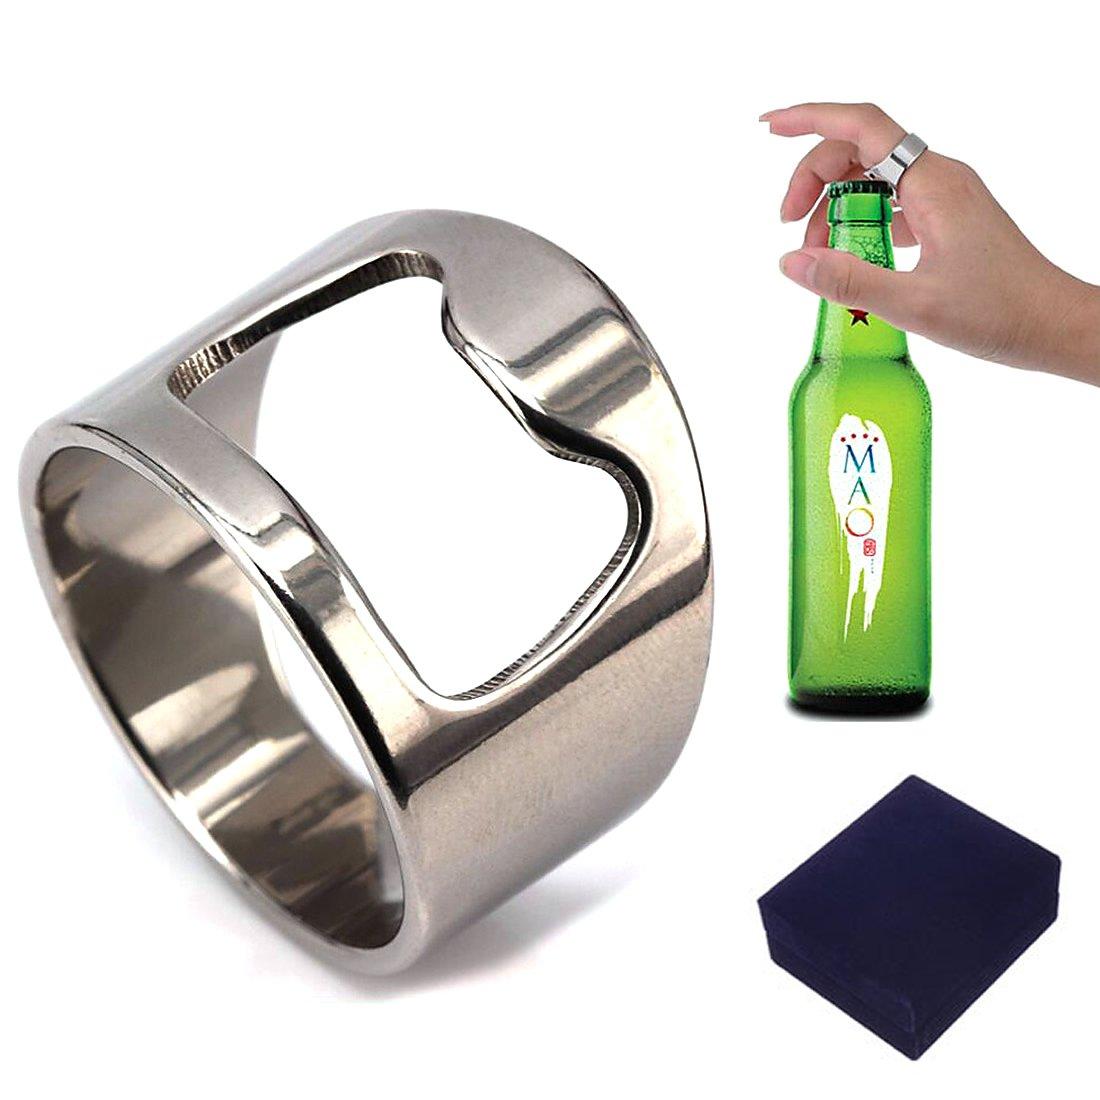 Handy Titanium Steel Bottle Opener Ring For Men Women (12)  Amazon.co.uk   Kitchen   Home 721fdbb3ea